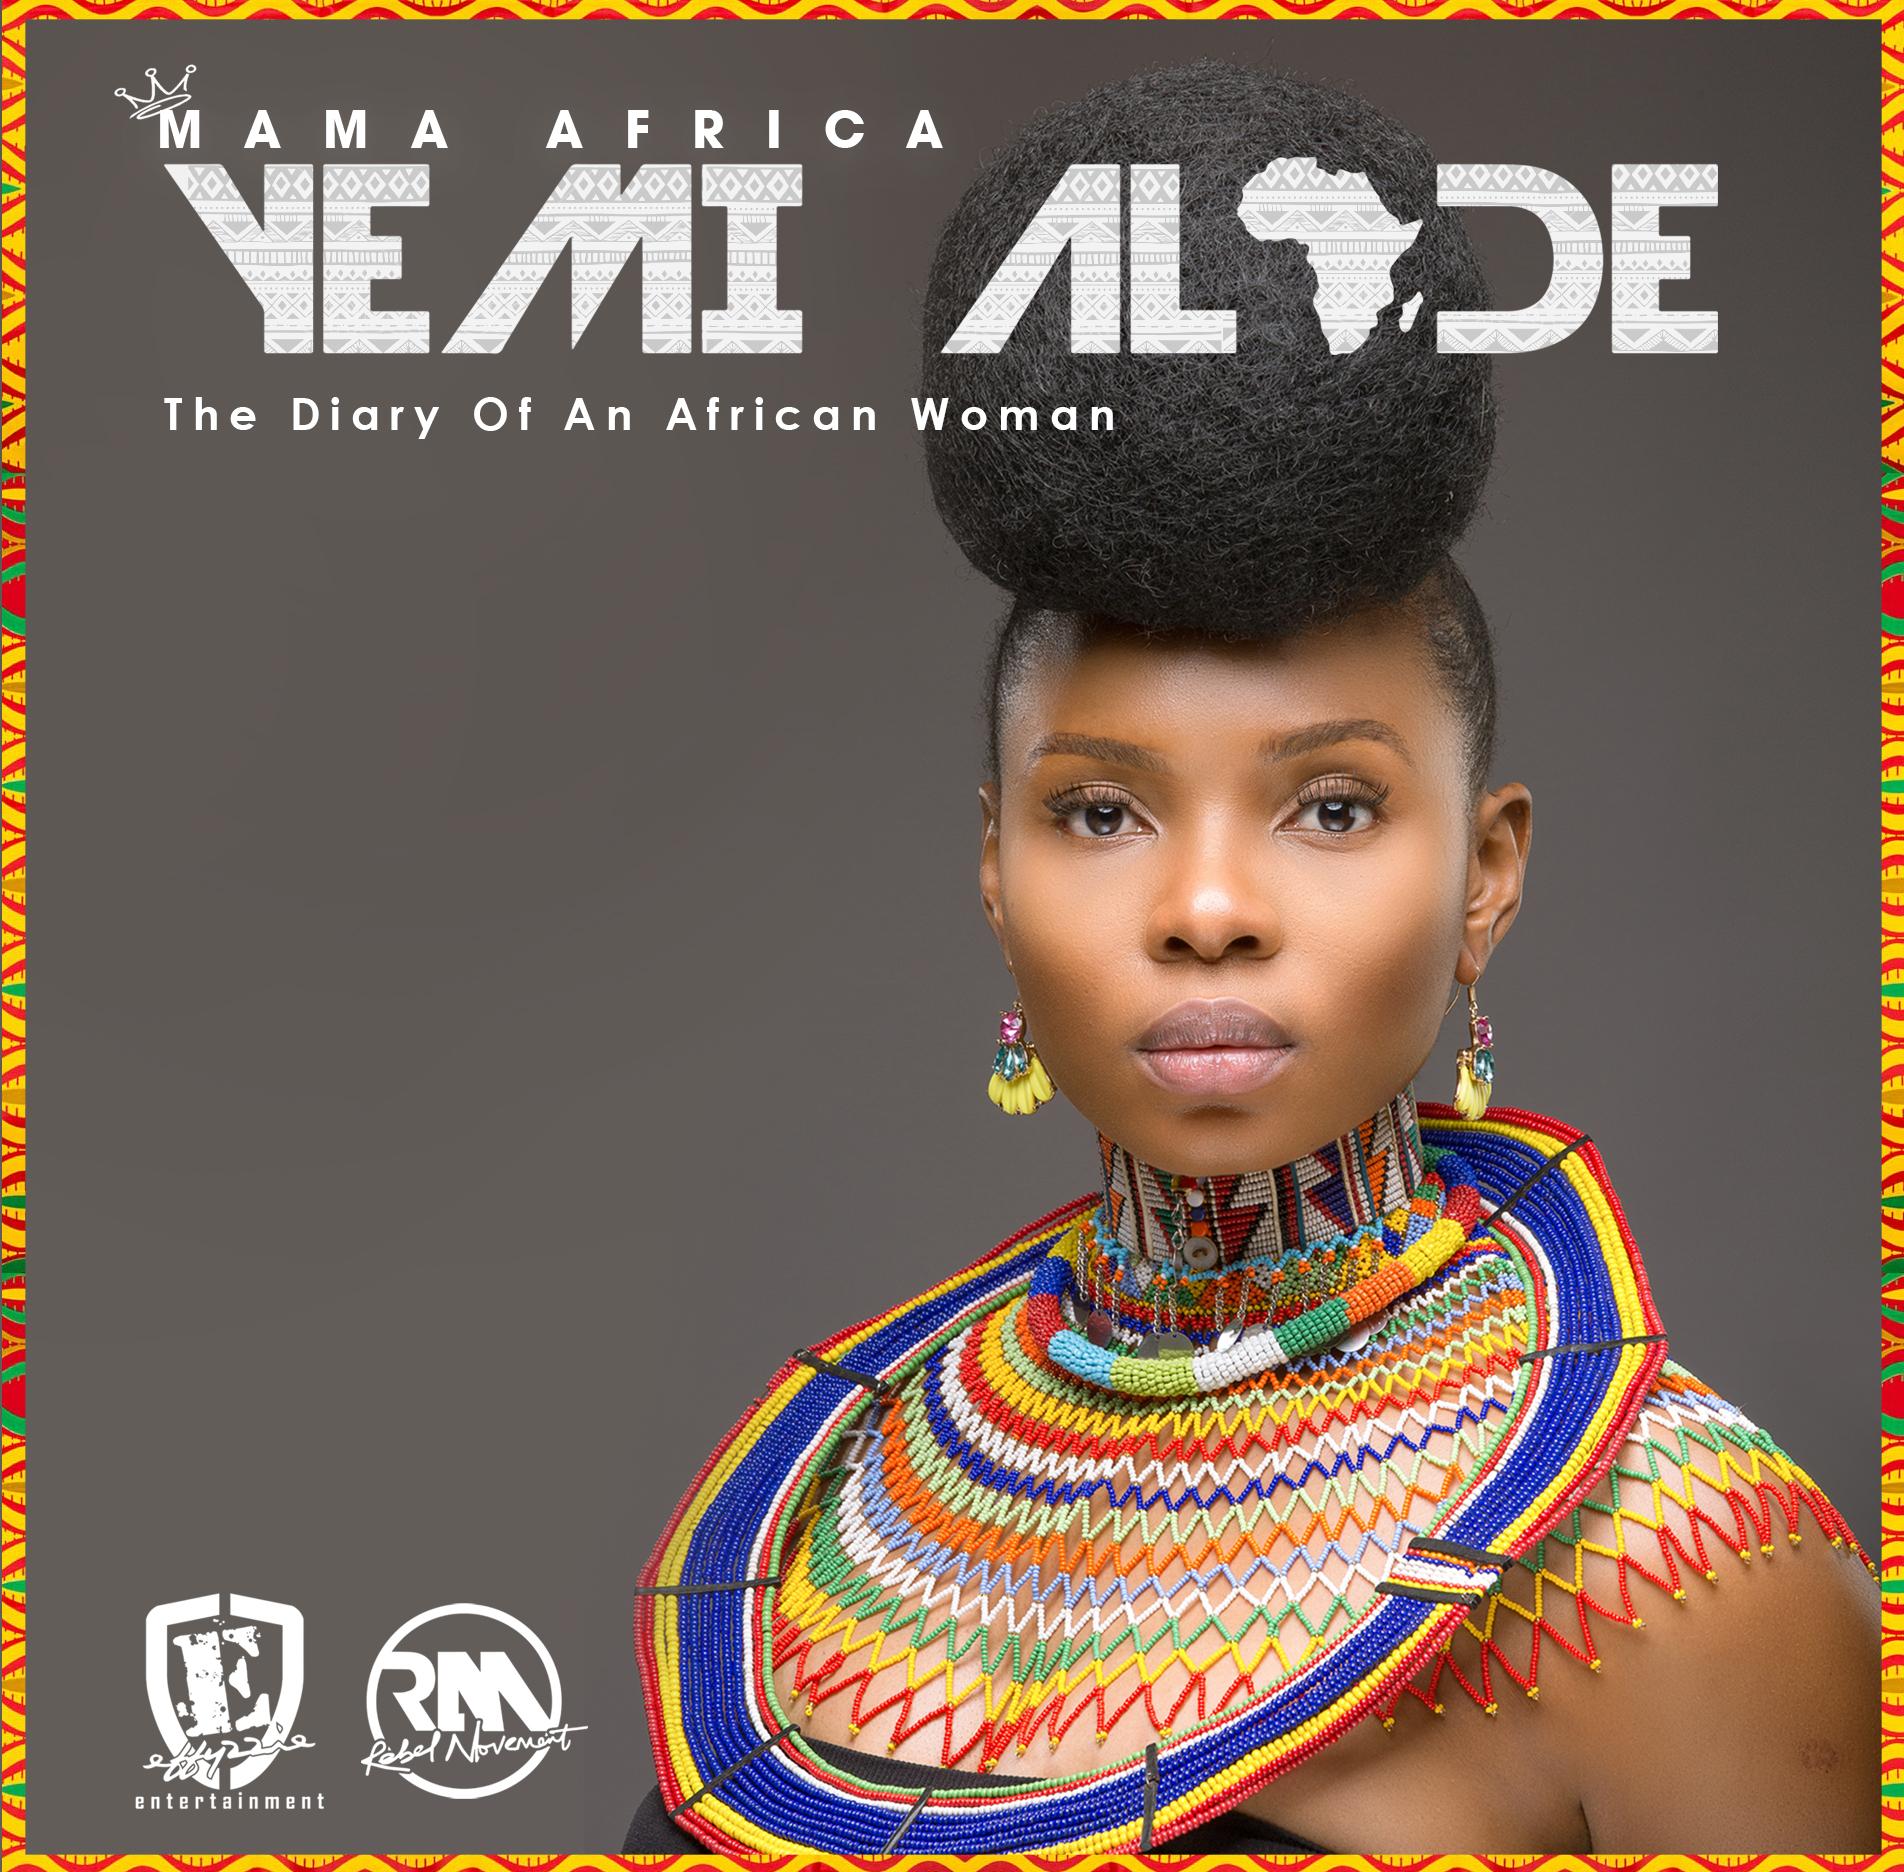 Yemi-Alade-Mama-Africa-Standard-Album-Cover-Art.jpg